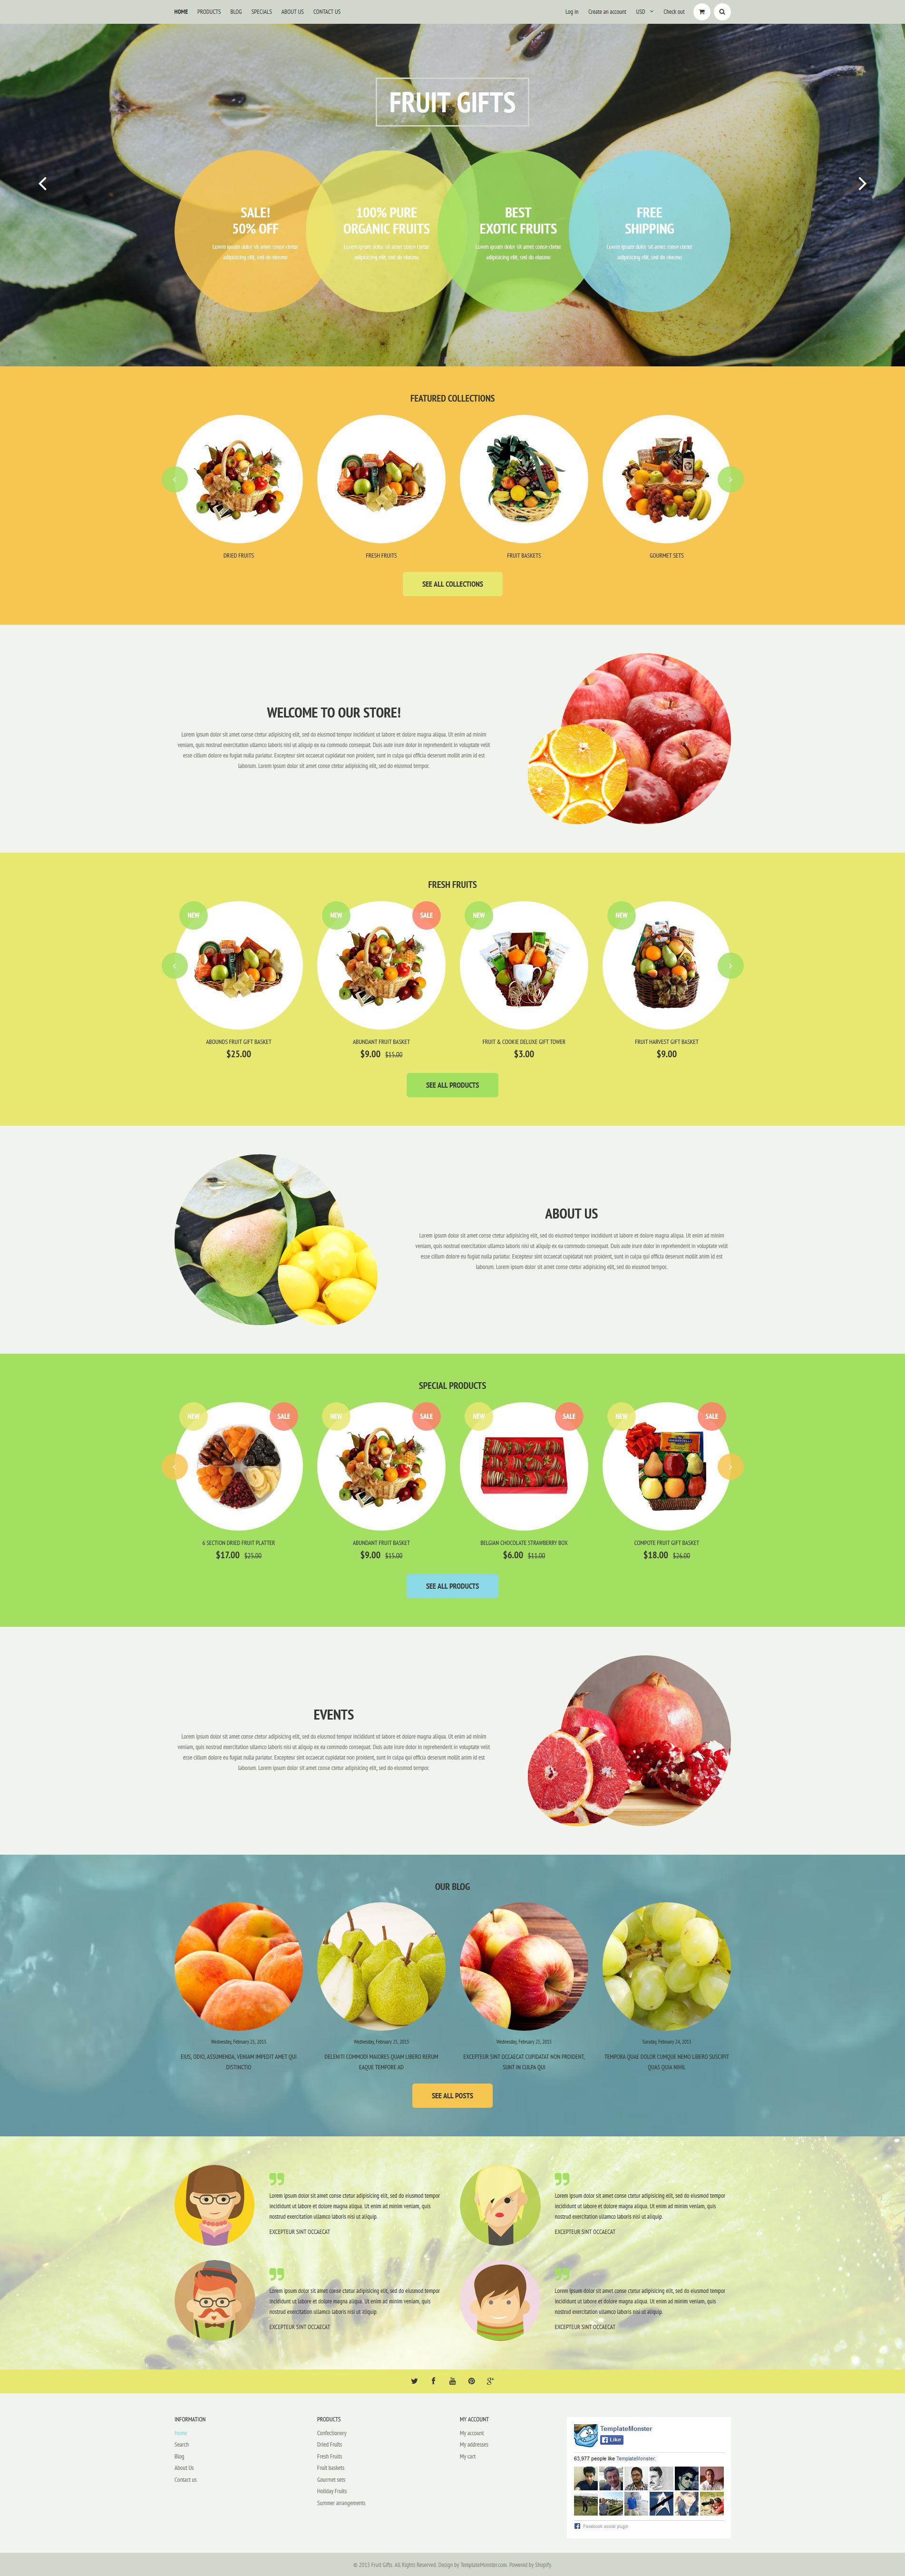 Responsivt Fruit Shop Shopify-tema #53345